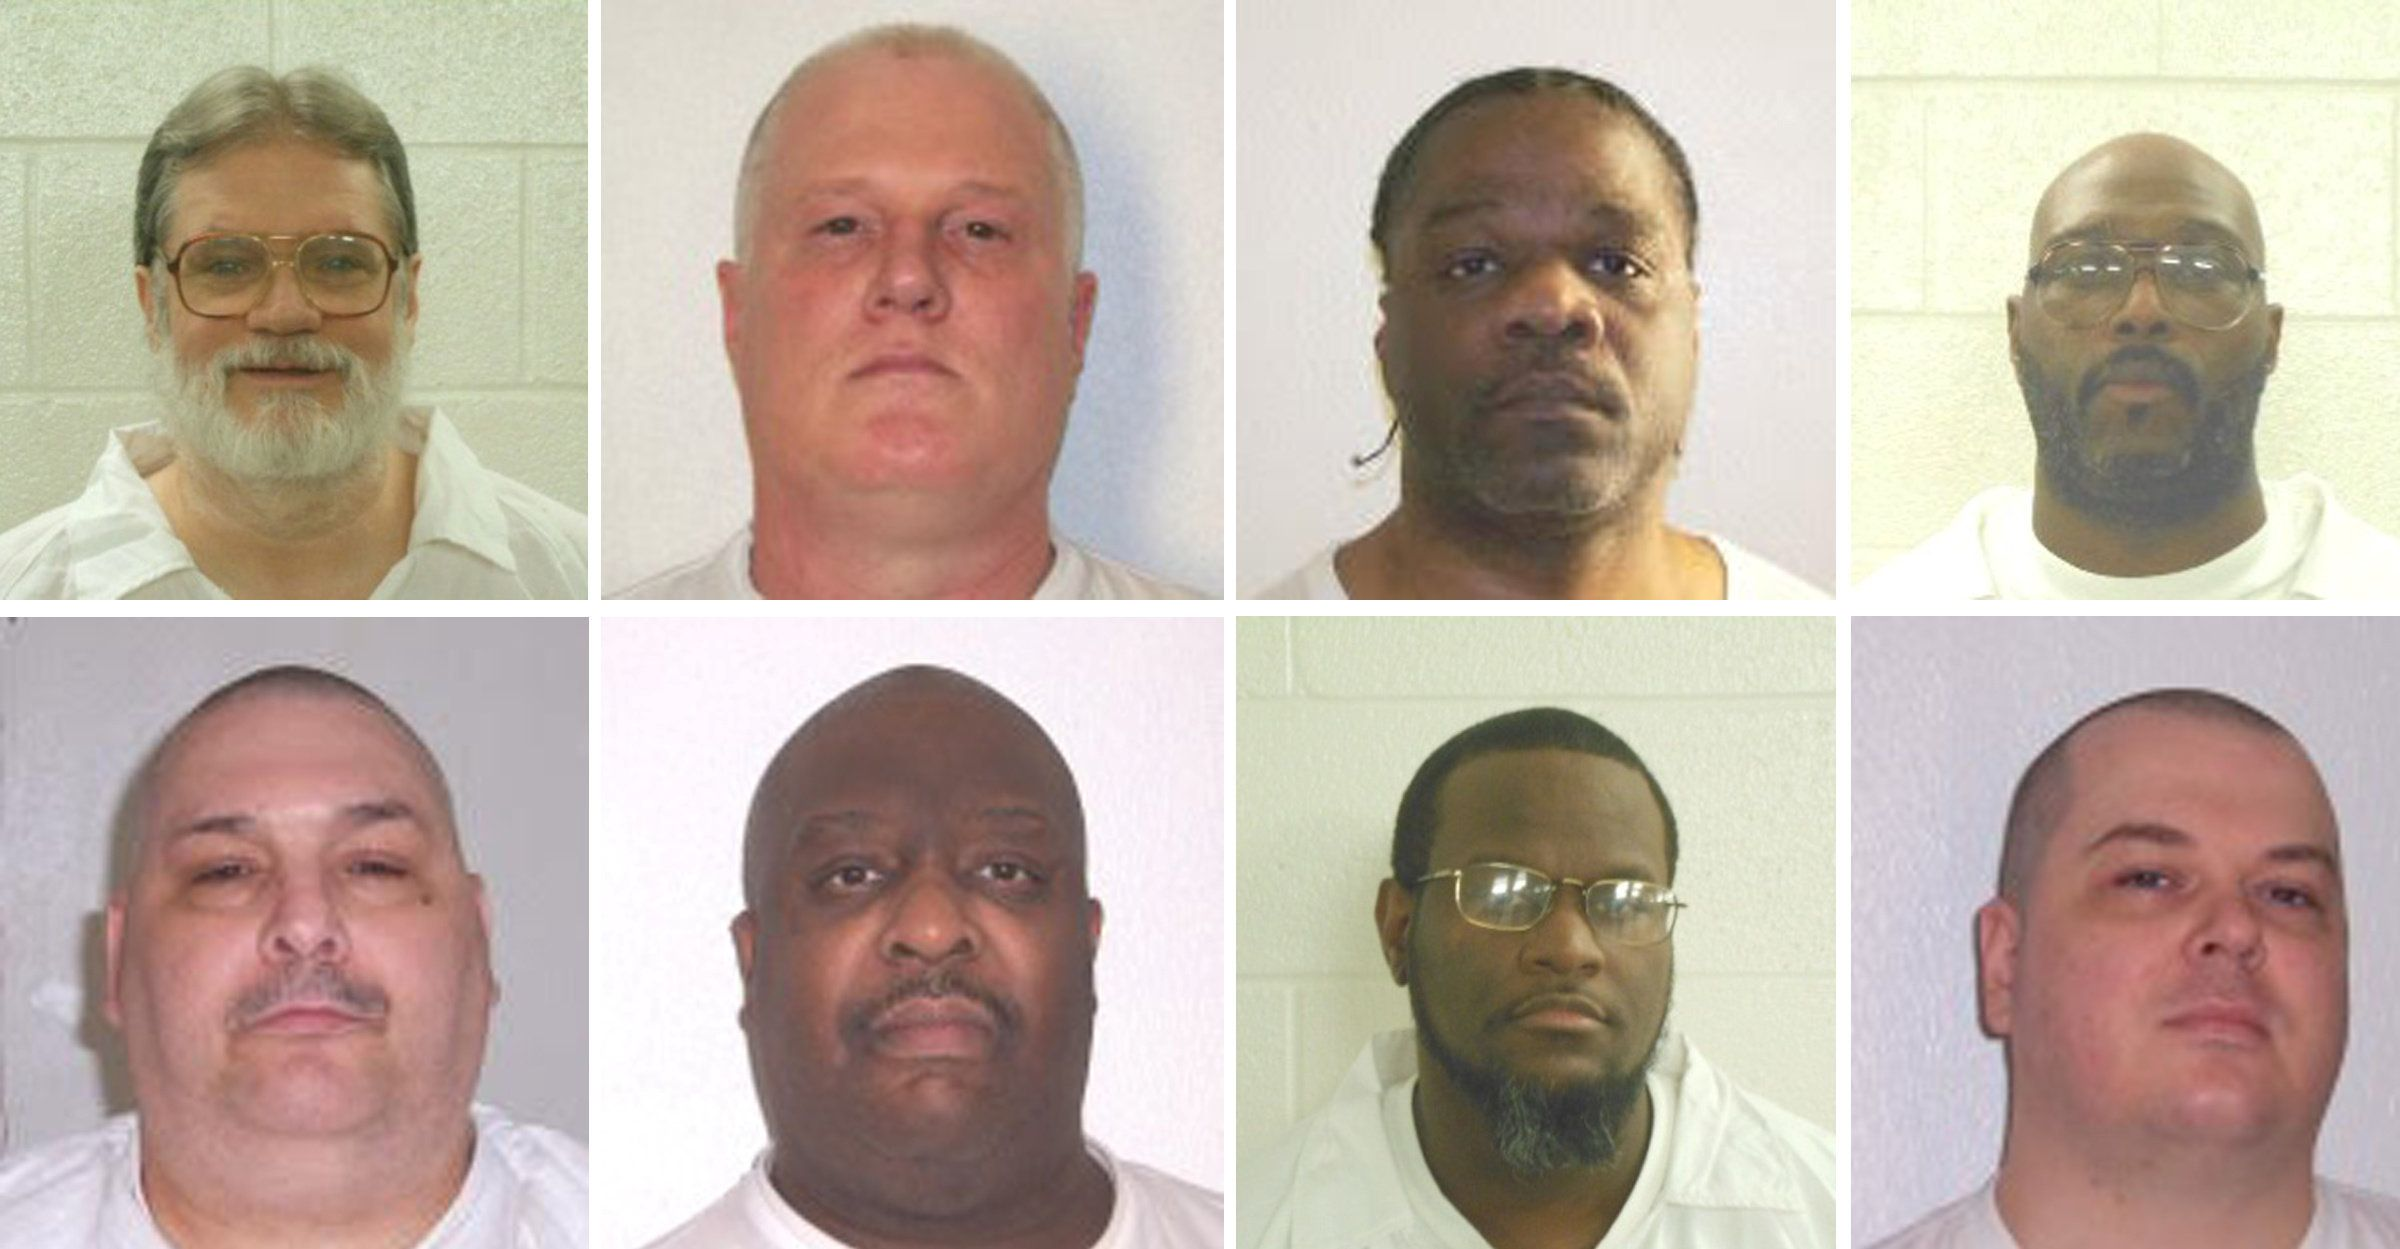 Inmates Bruce Ward (top row L to R), Don Davis, Ledell Lee, Stacy Johnson, Jack Jones (bottom row L to R), Marcel Williams, K